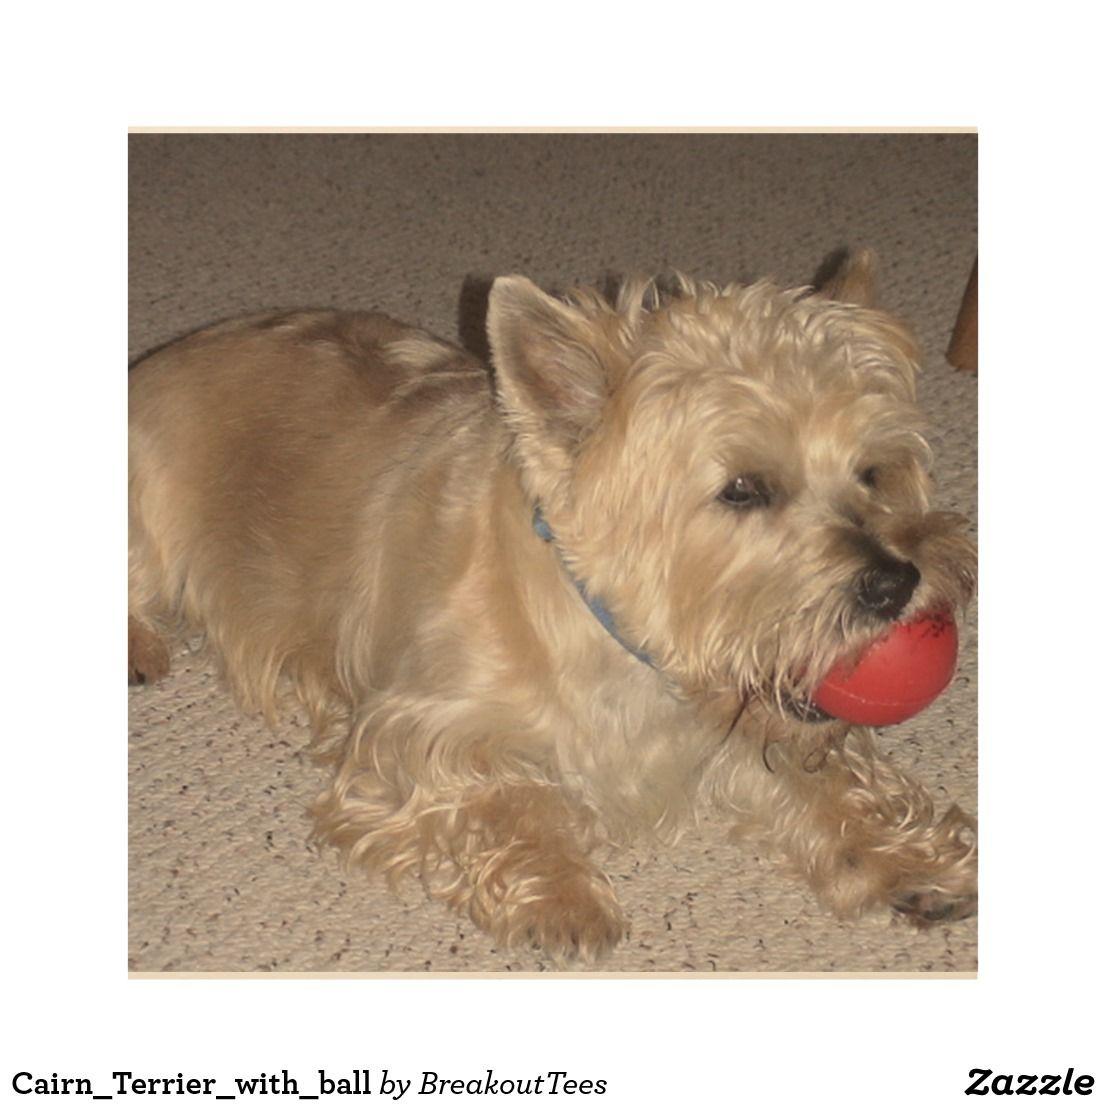 Cairn Terrier With Ball Cairn Terrier Cairn Terrier Puppies